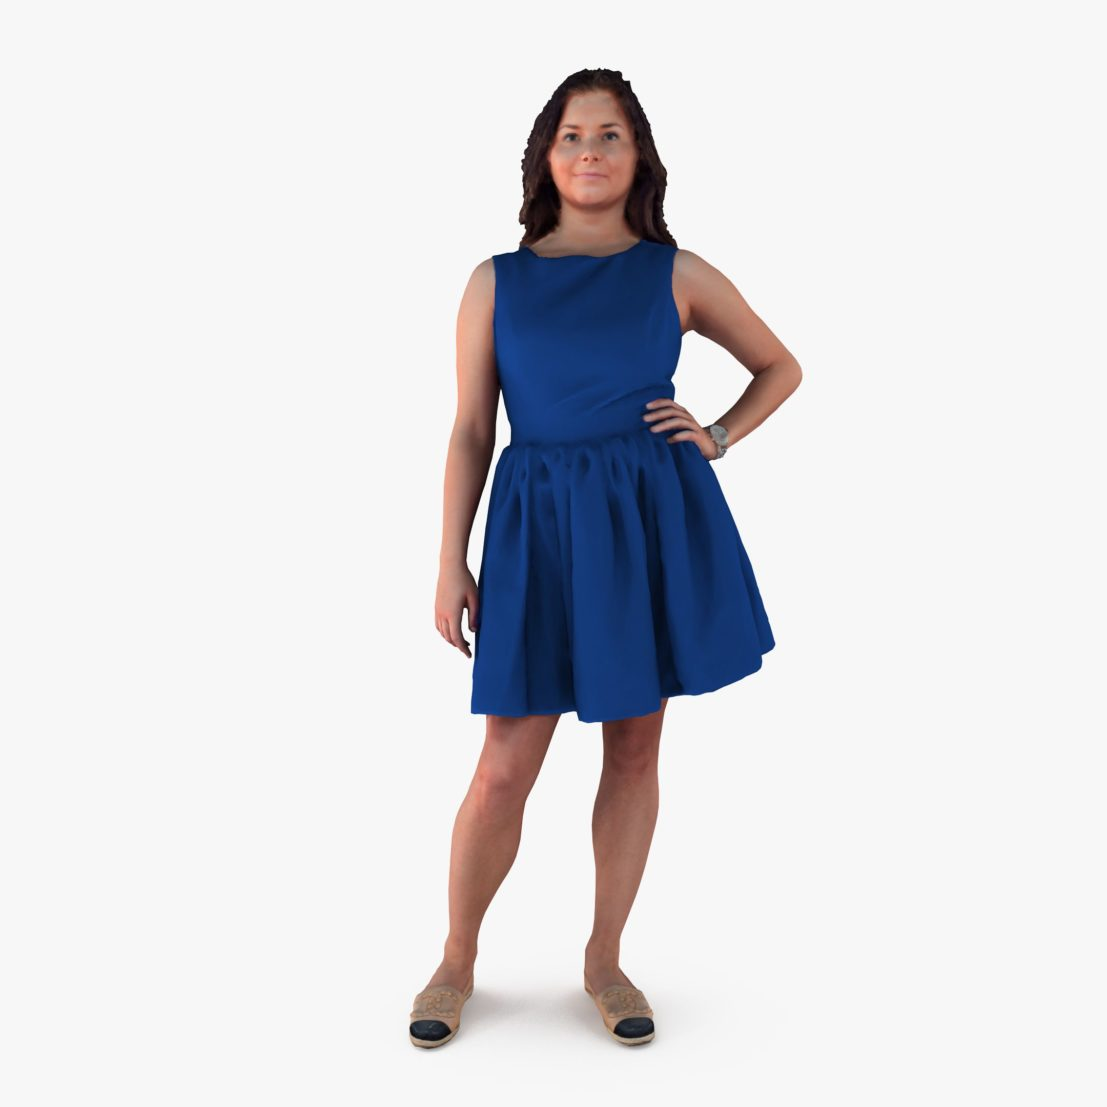 Woman Posed Casual Dress 3D Model | 3DTree Scanning Studio